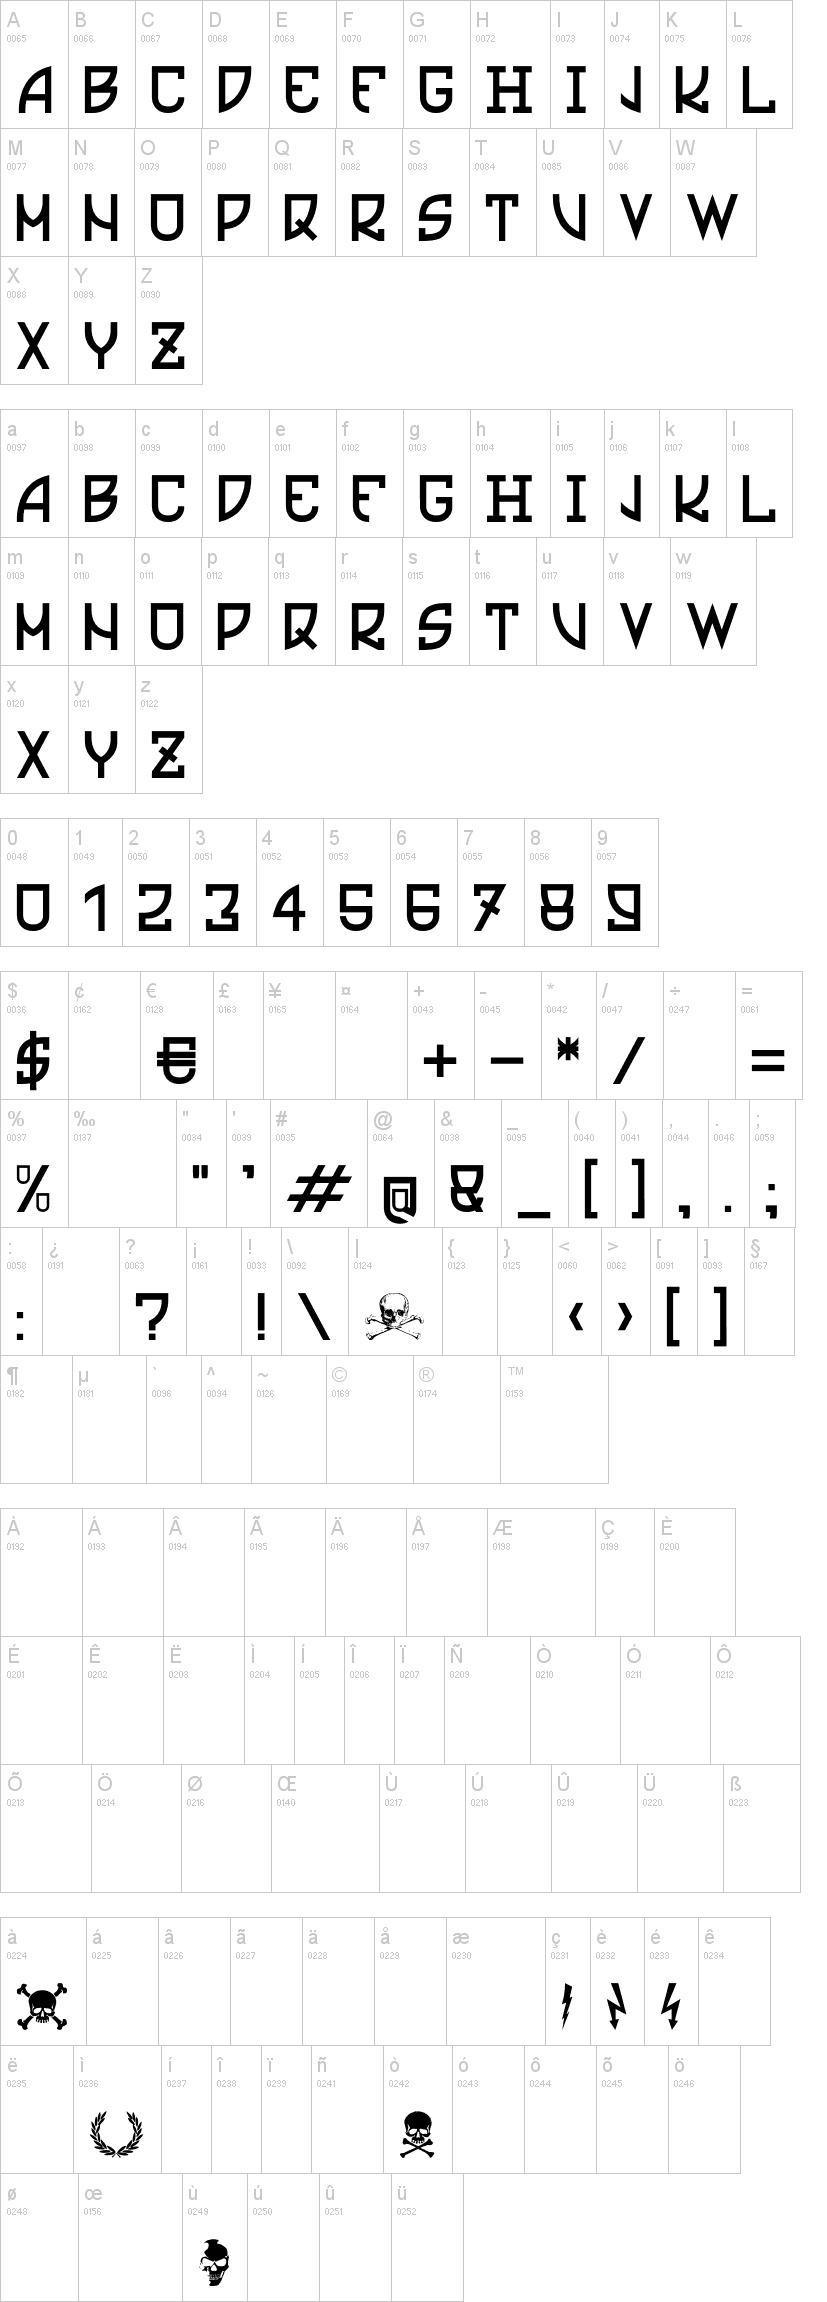 caratteri dafont